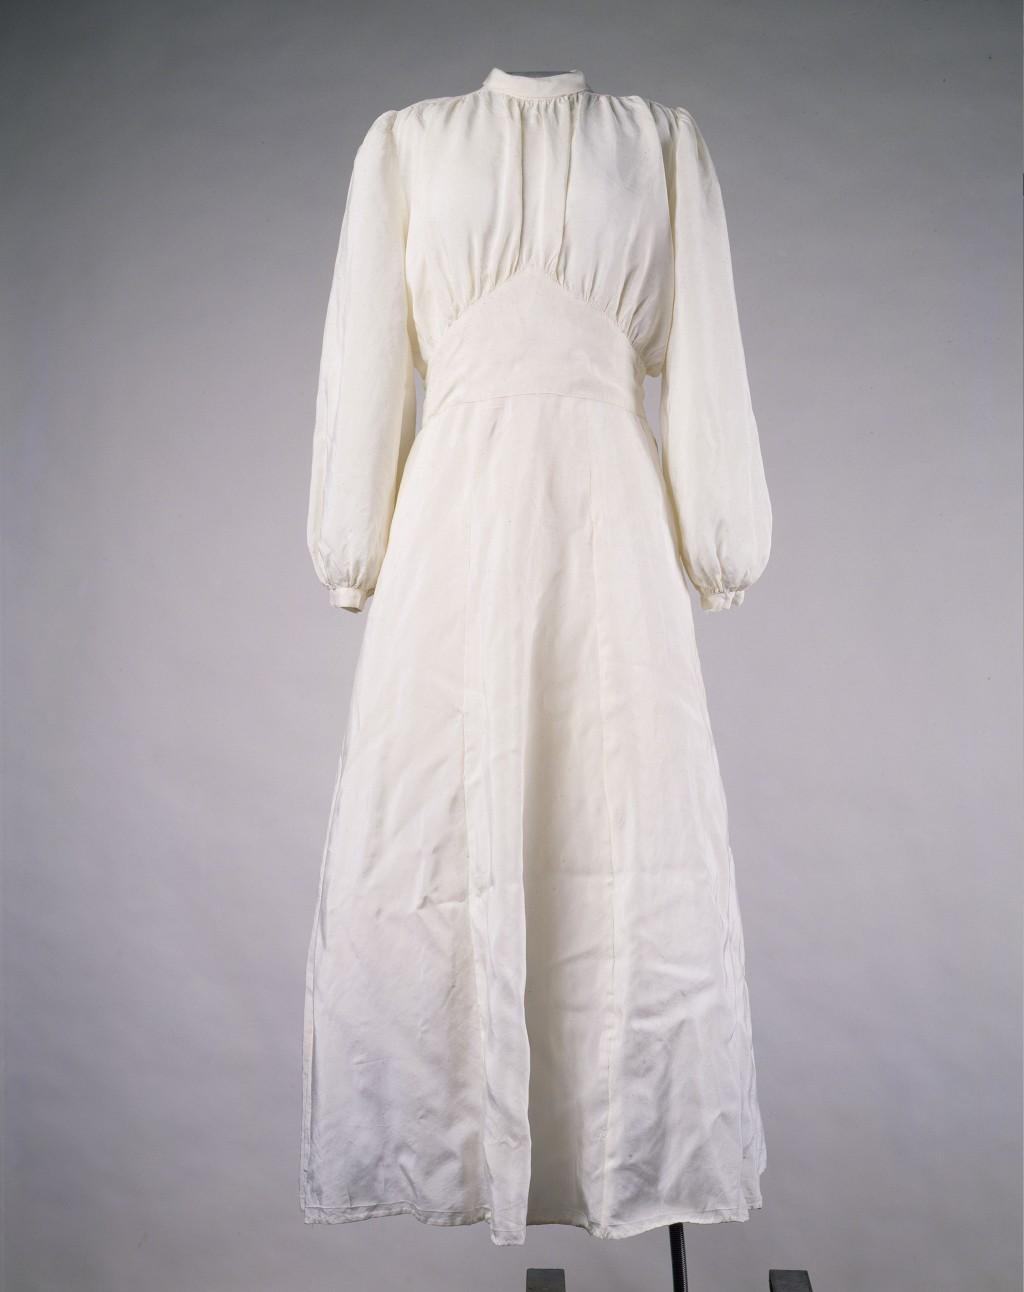 Wedding Dress [LCID: 2015yjjh]